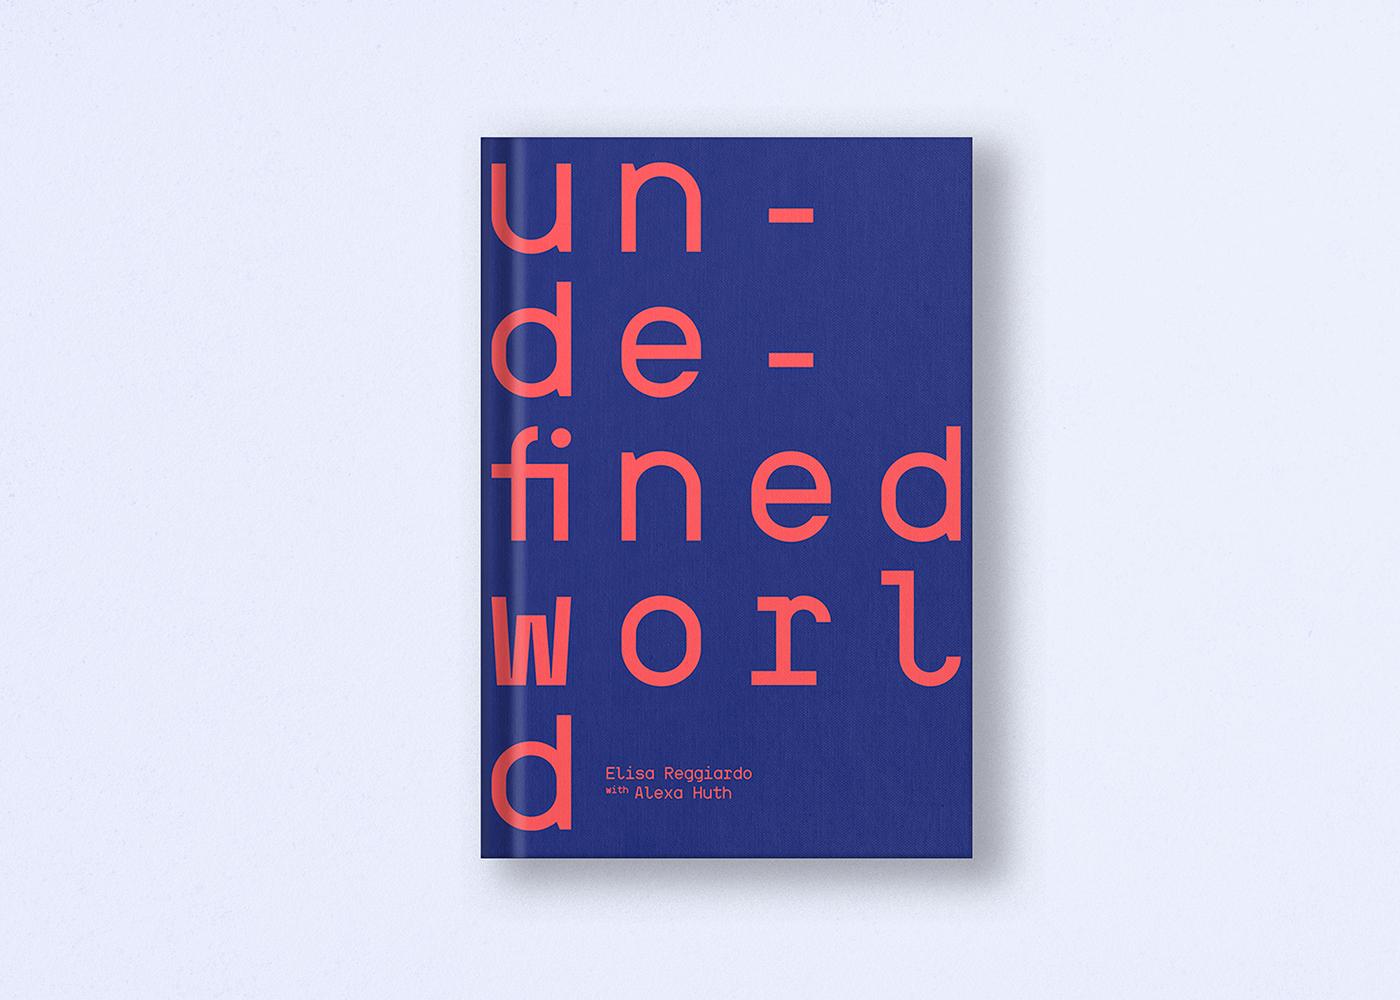 undefined world